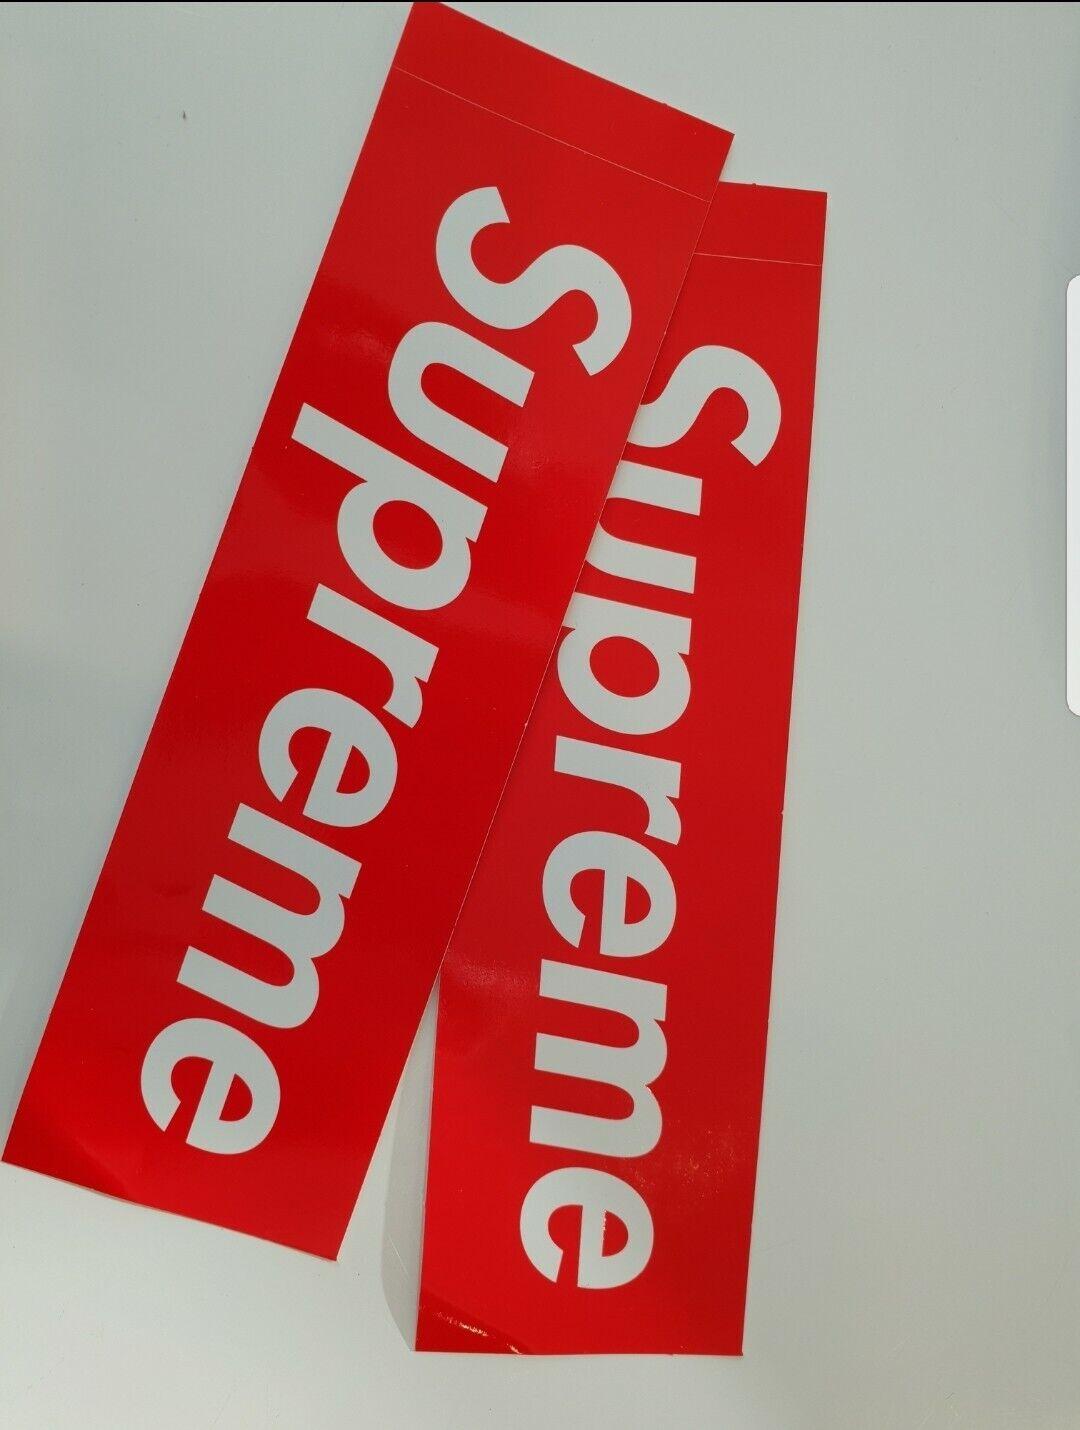 Supreme Box Logo Stickers 100% AuthenticCHEAPEST ON EBAY